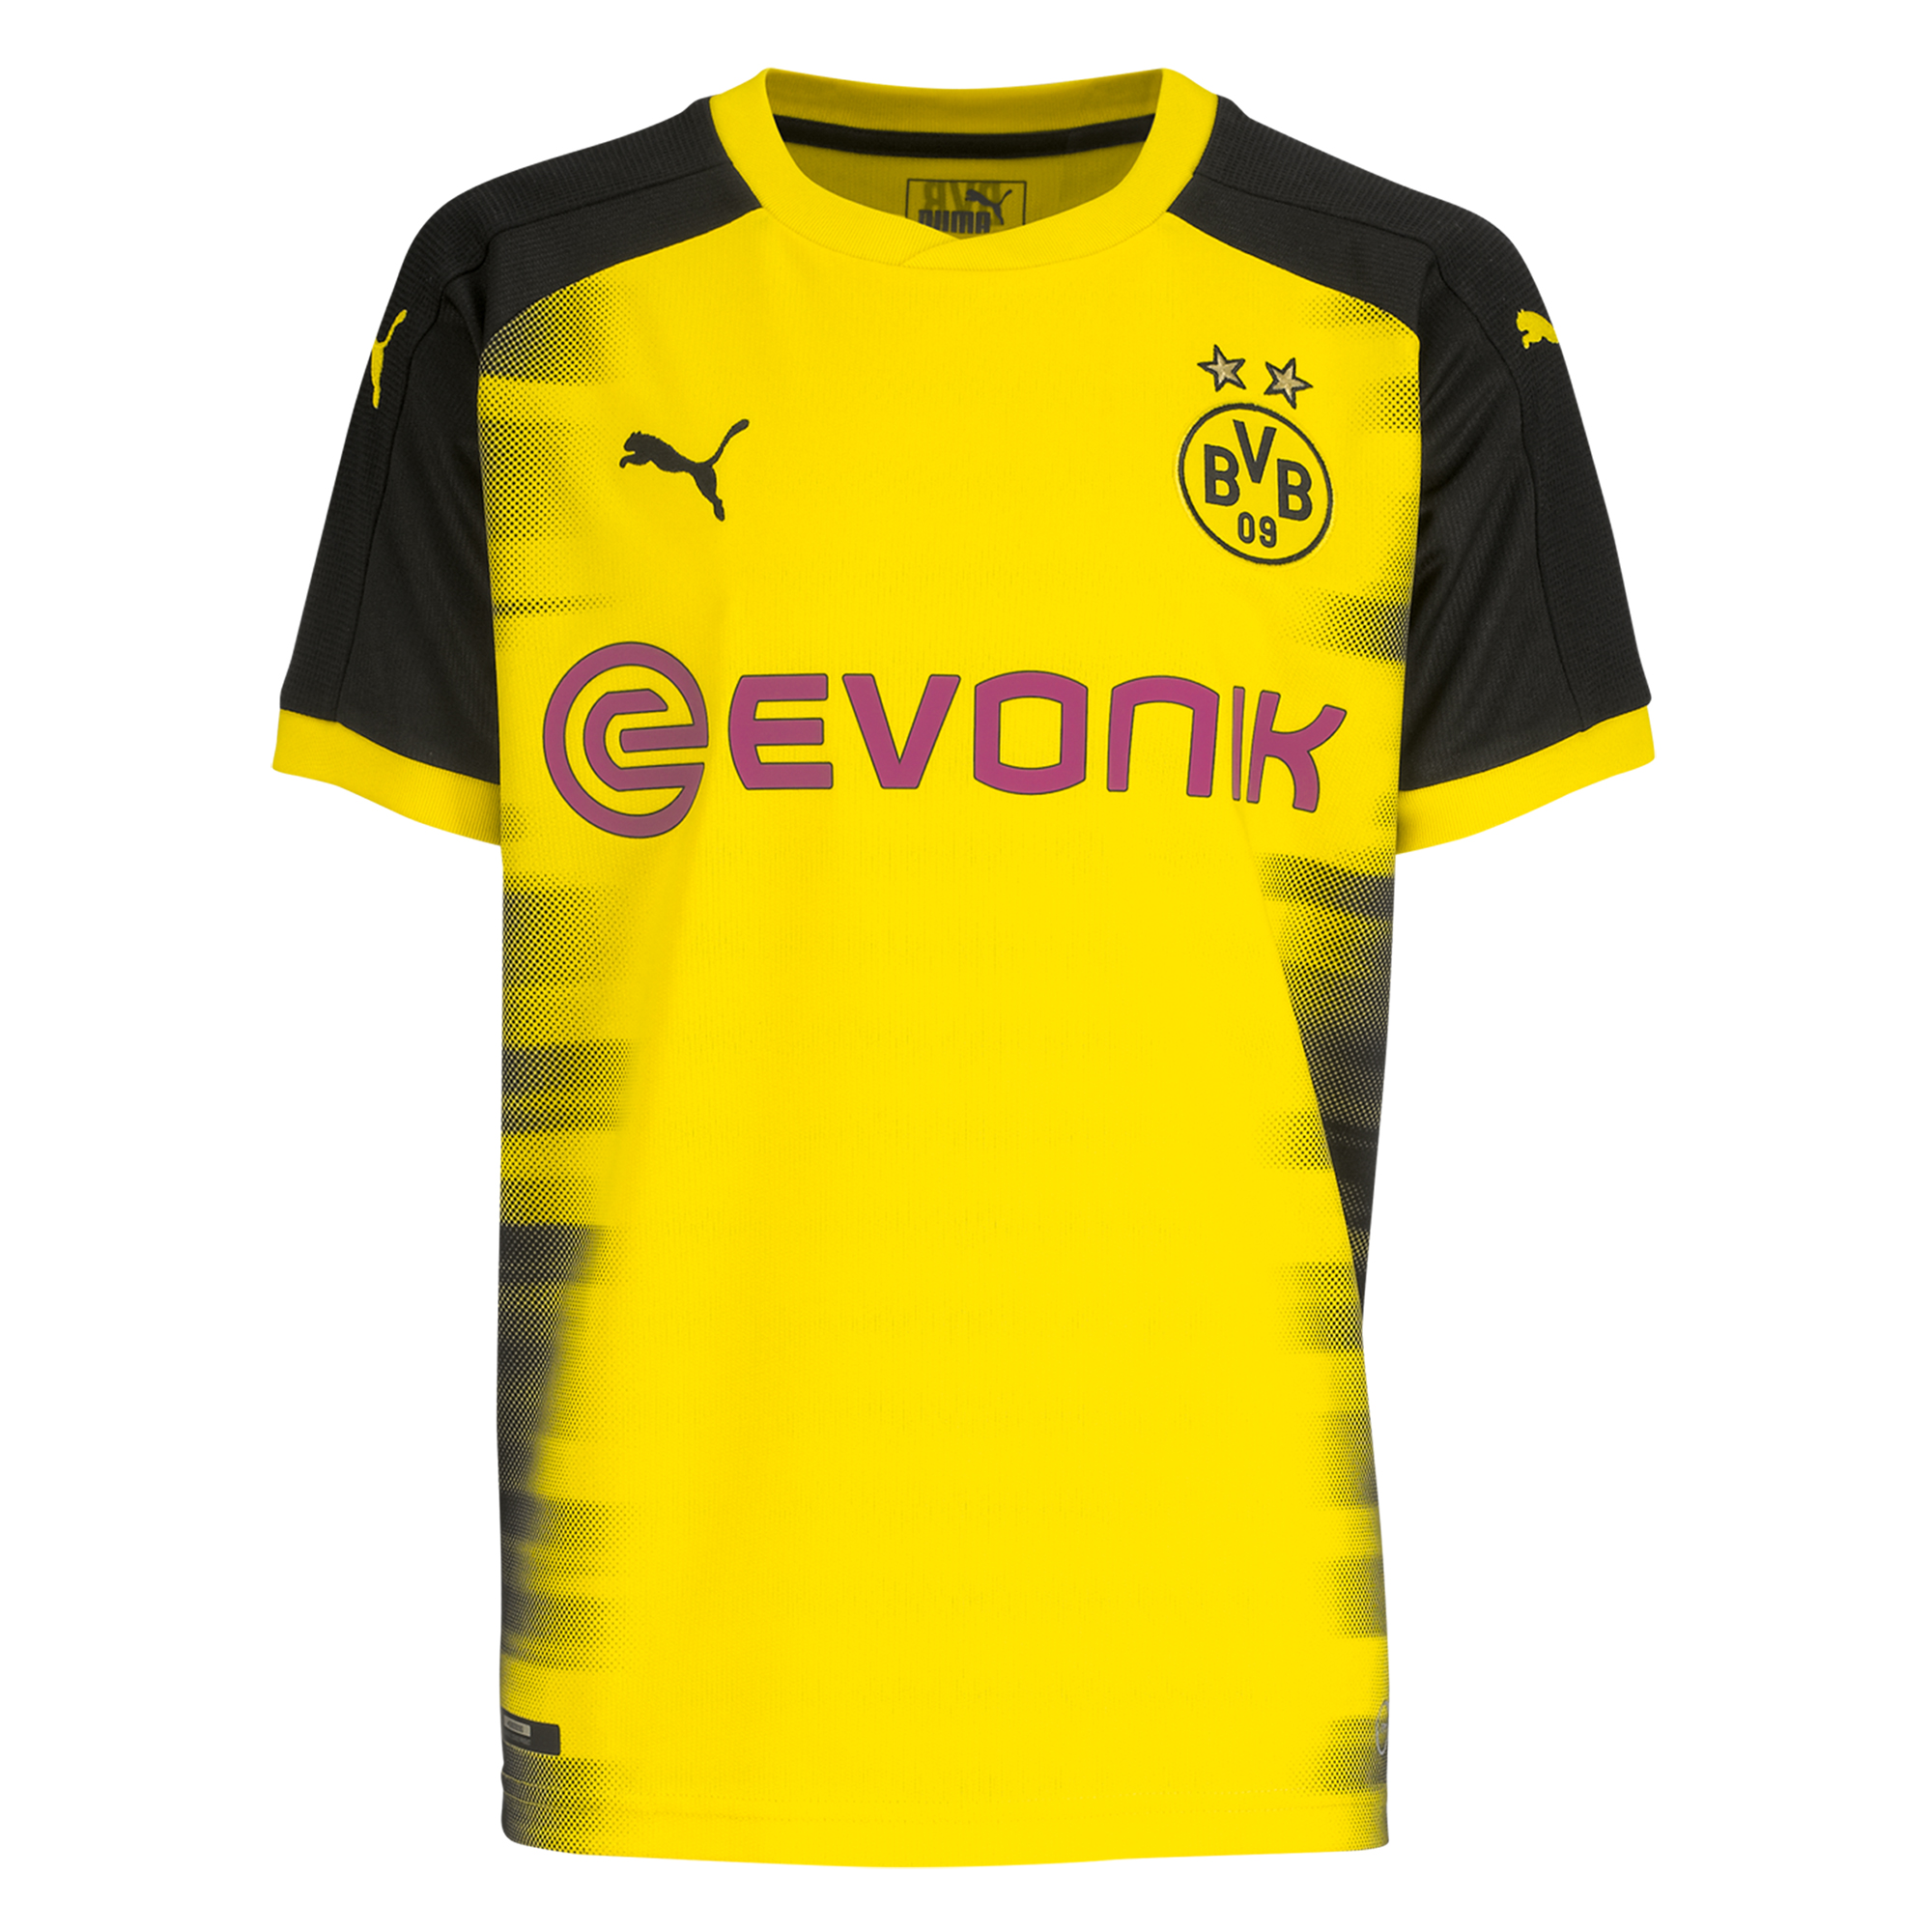 1b2e218e53f ... Borussia Dortmund 2017-18 Puma Third Kit · Click to enlarge image  borussia_dortmund_17_18_puma_international_kit_a.jpg ...